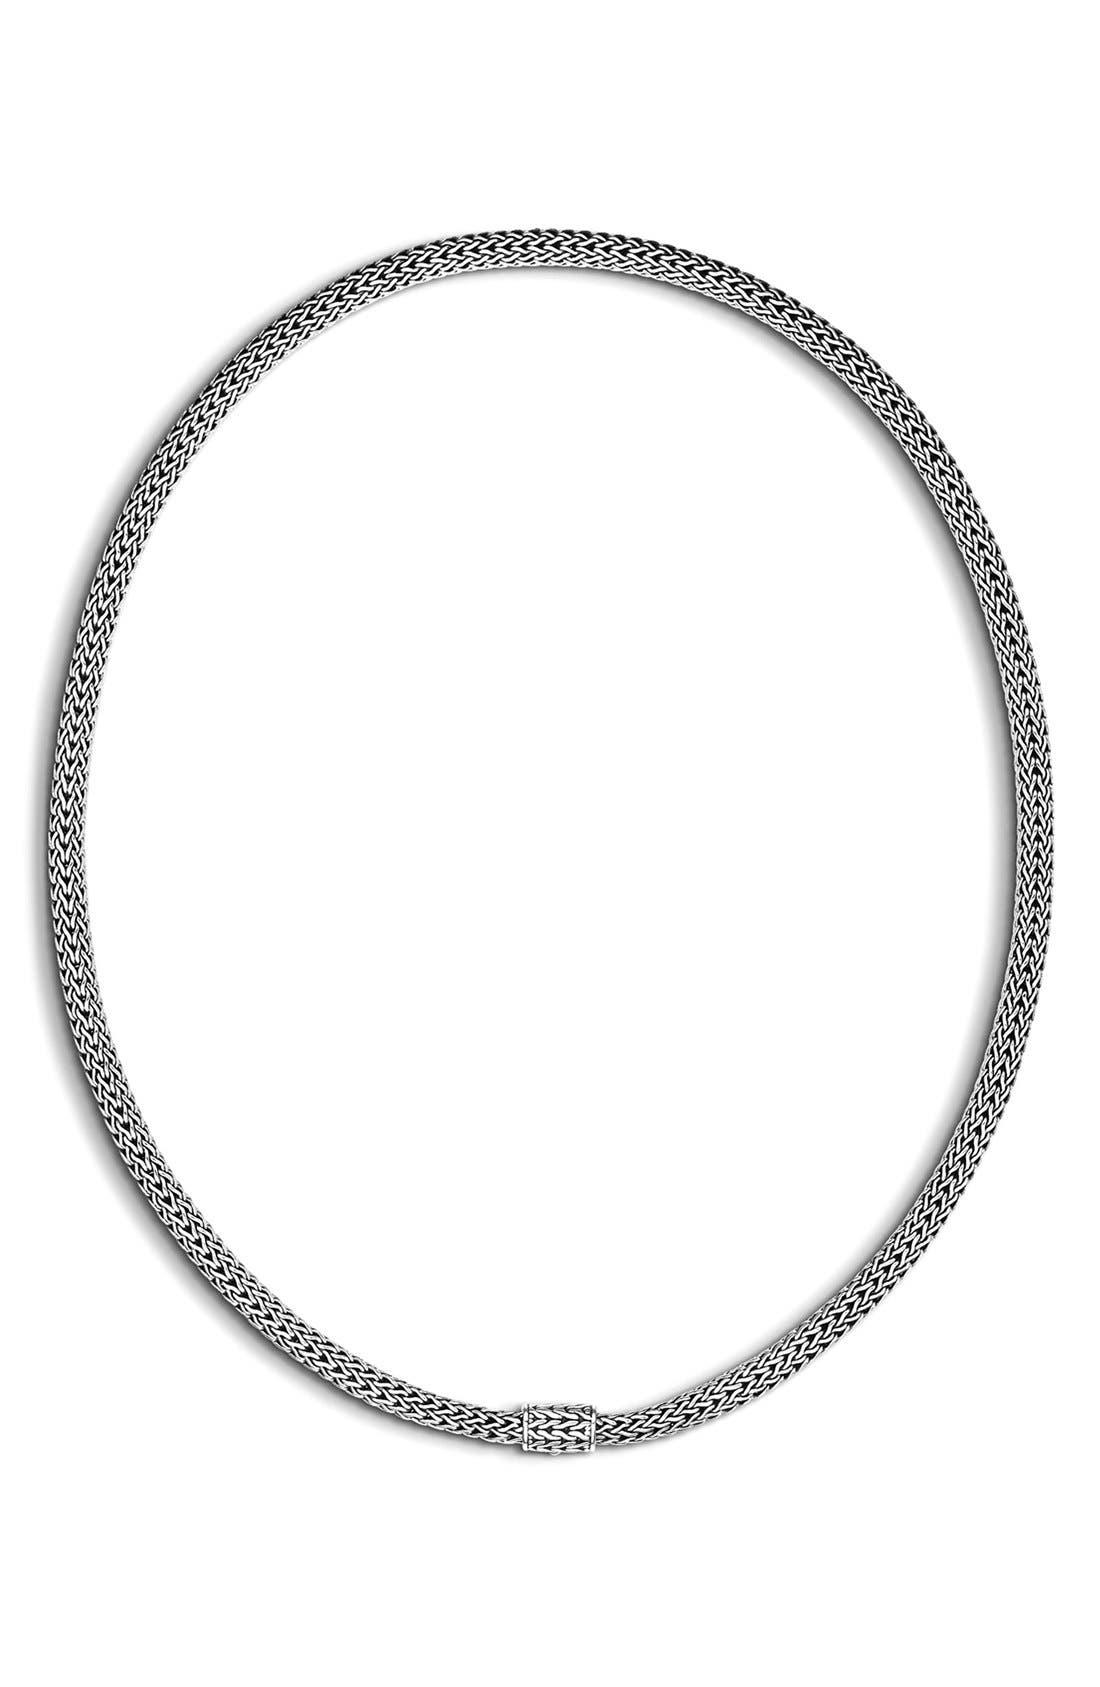 John Hardy Extra-Small Chain Necklace